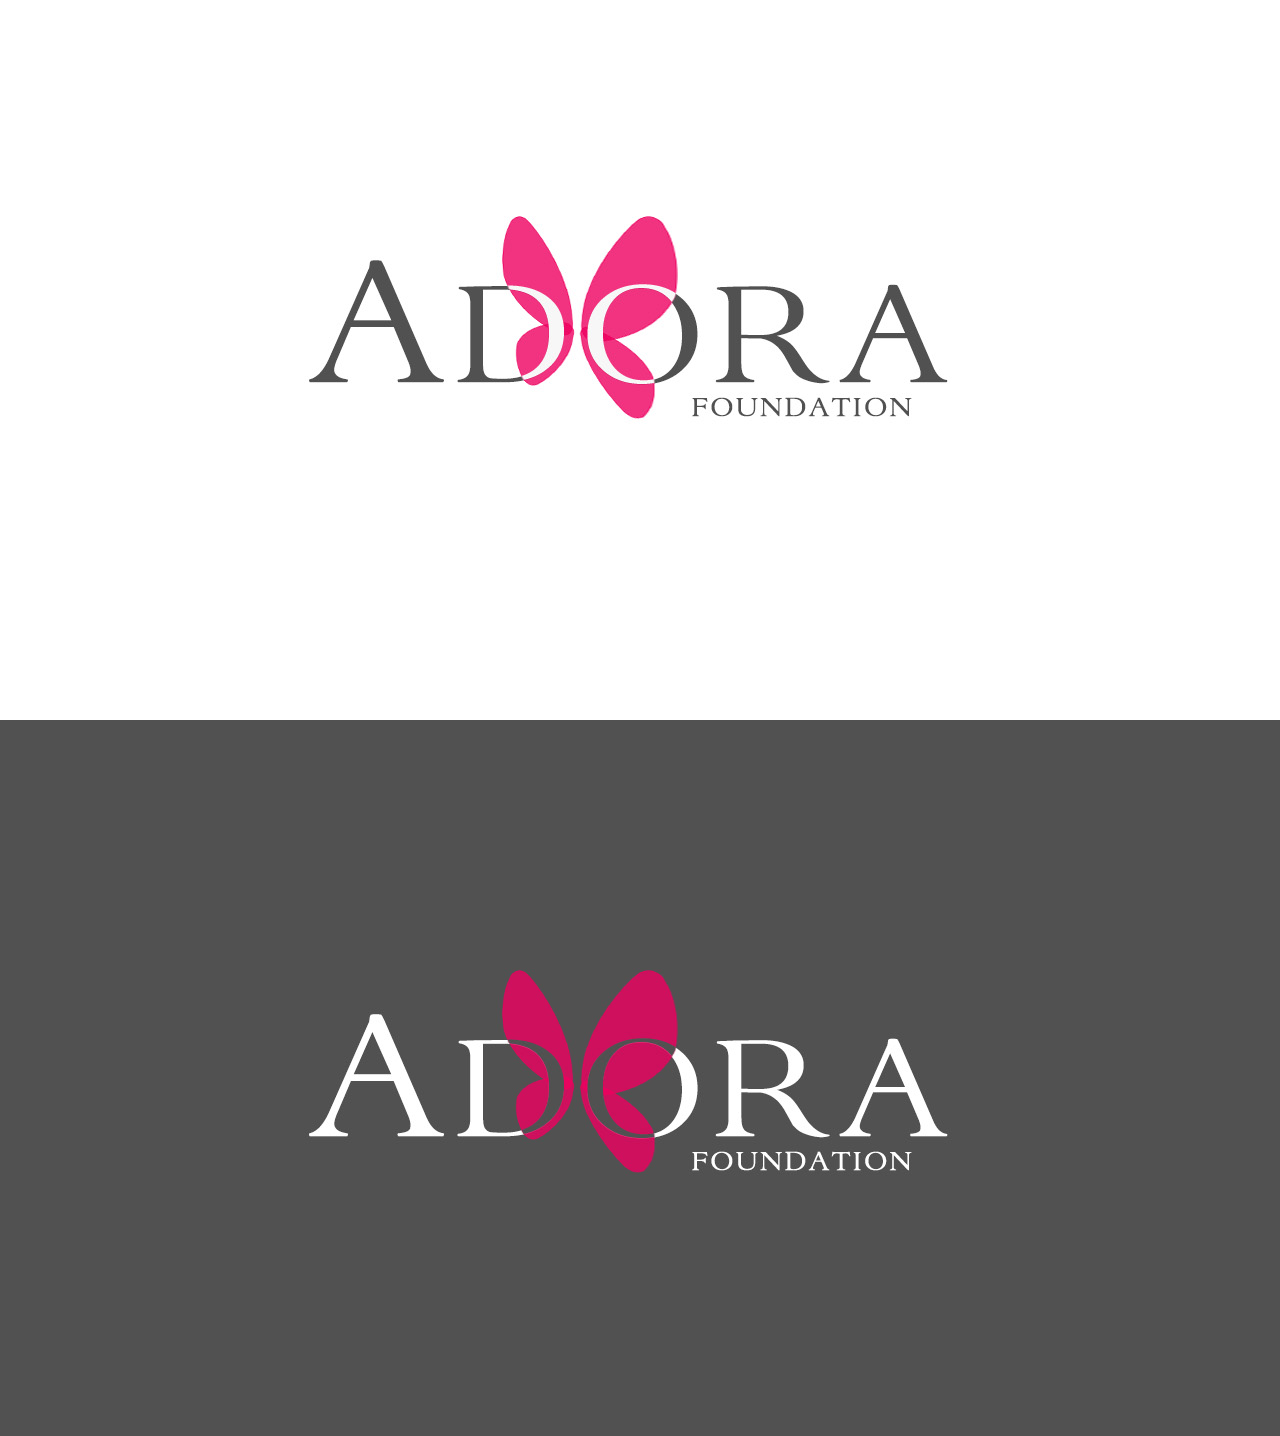 adora_versions